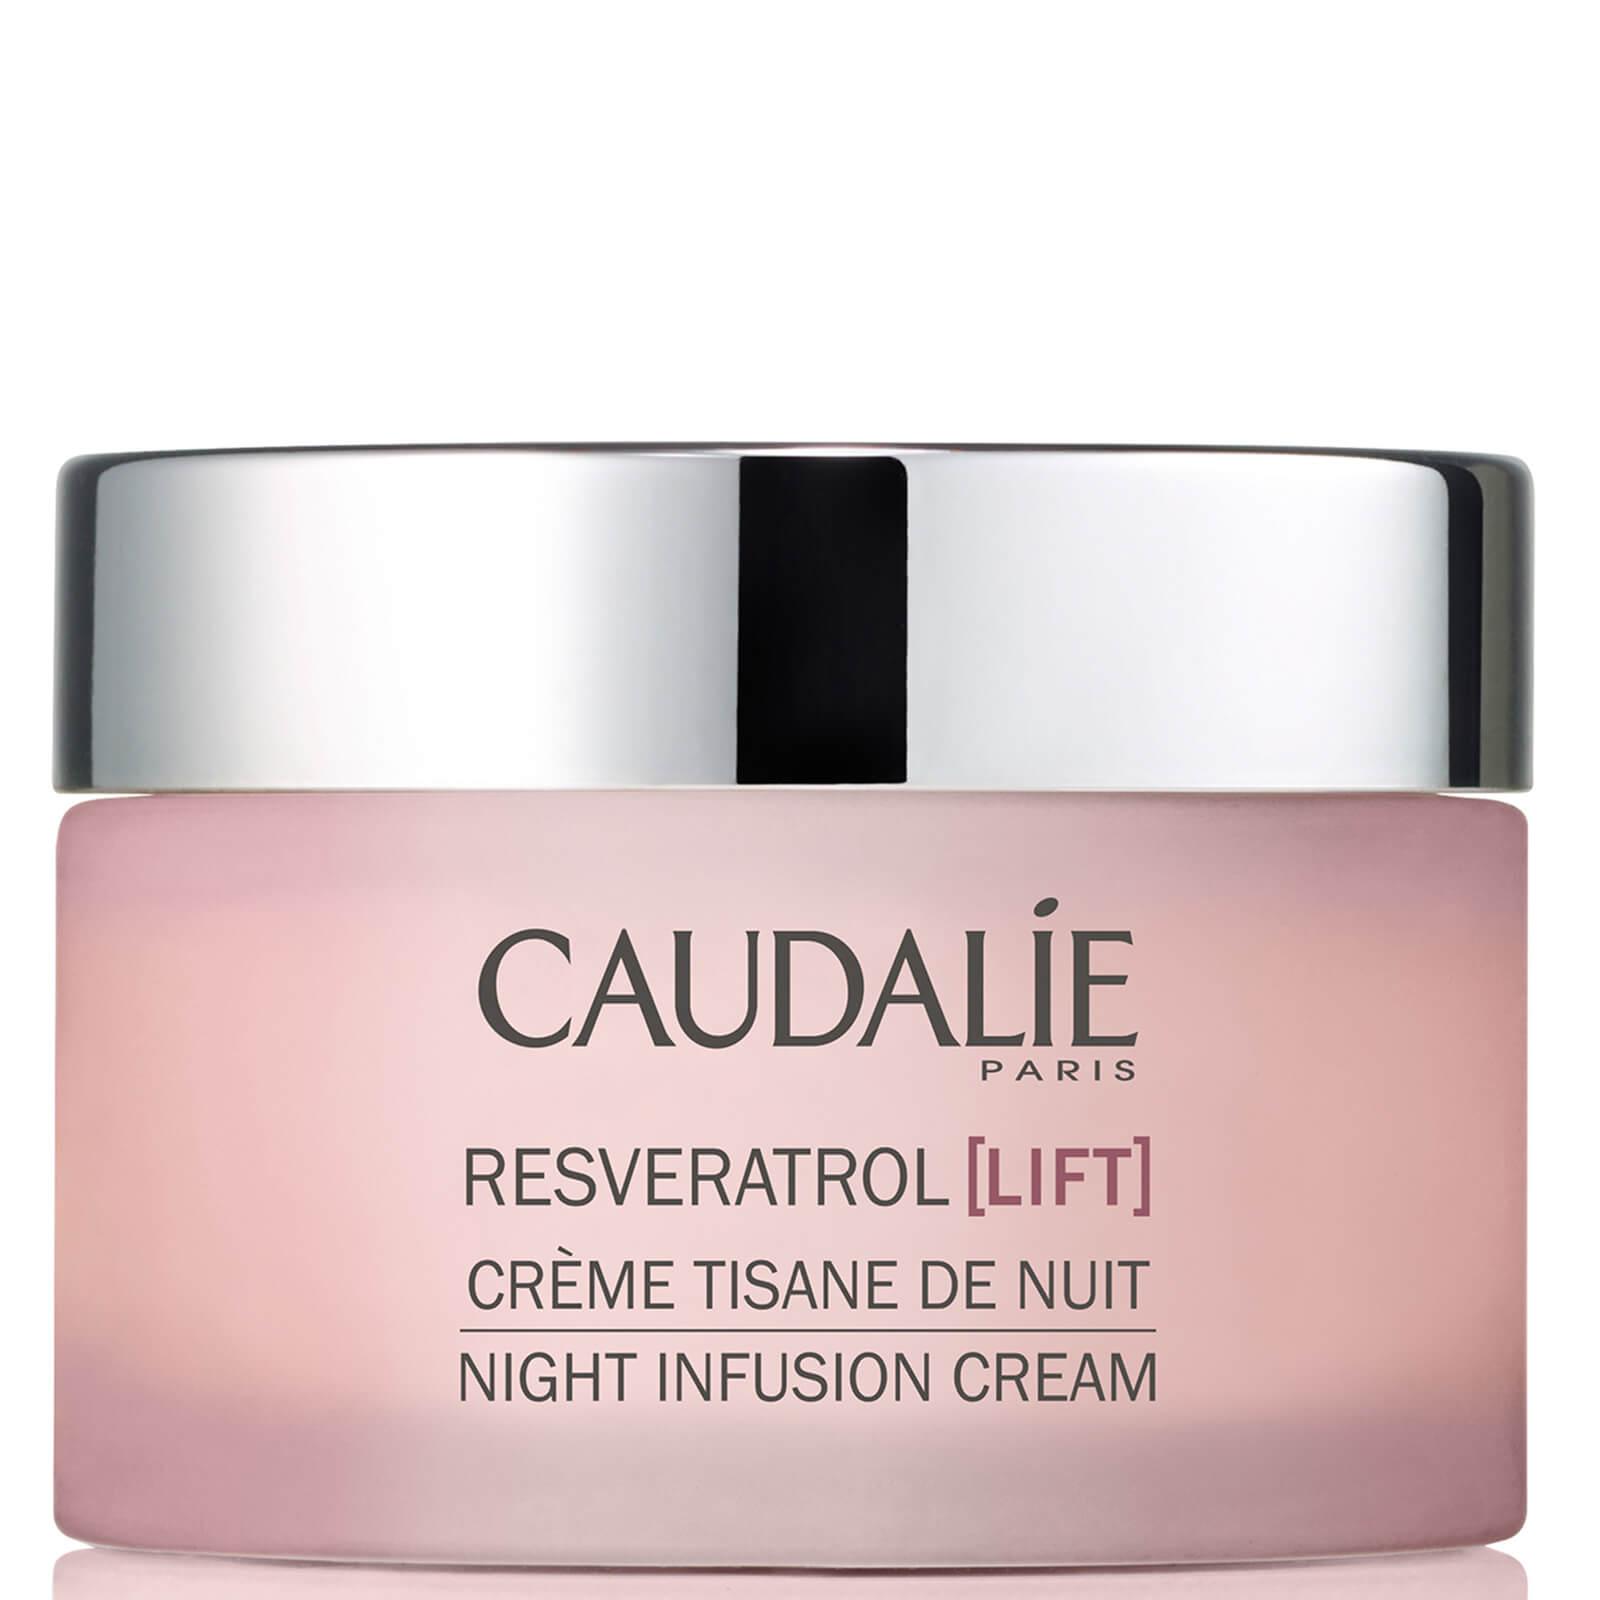 Caudalie Resvératrol Lift Night infusion cream (50ml)